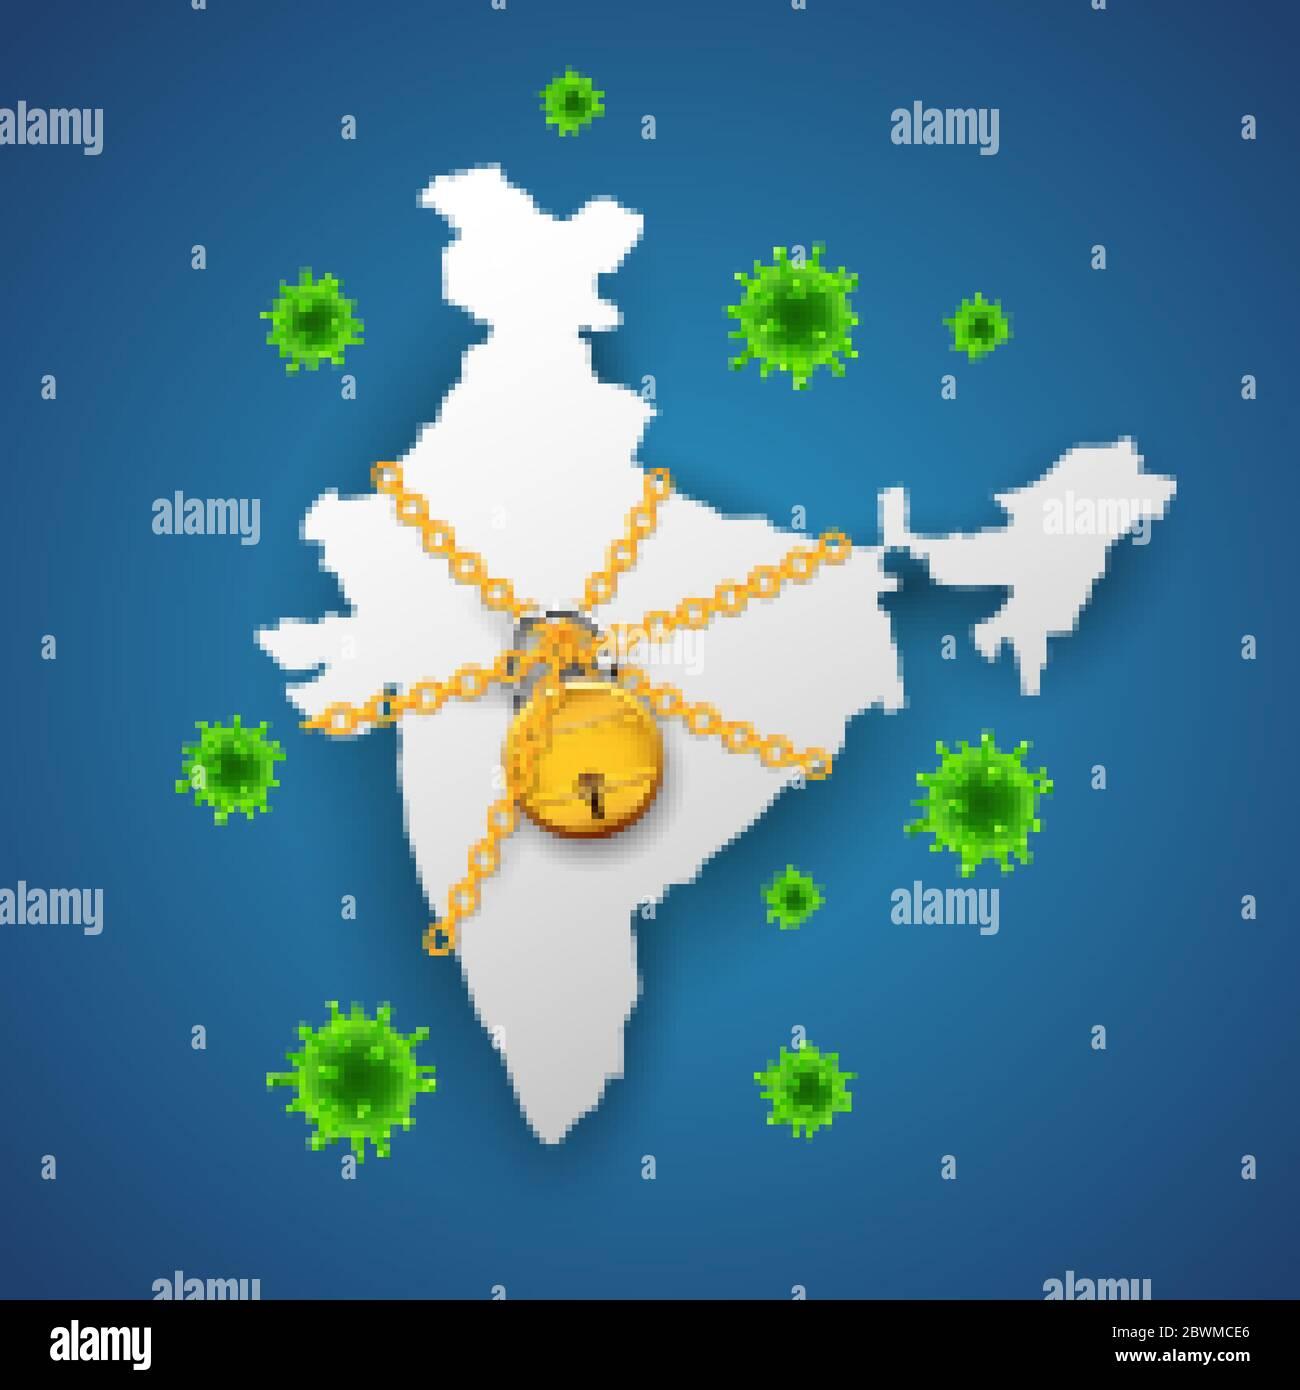 illustration of medical background showing India lockdown due to deadly Novel Coronavirus 19 epidemic outbreak Stock Vector